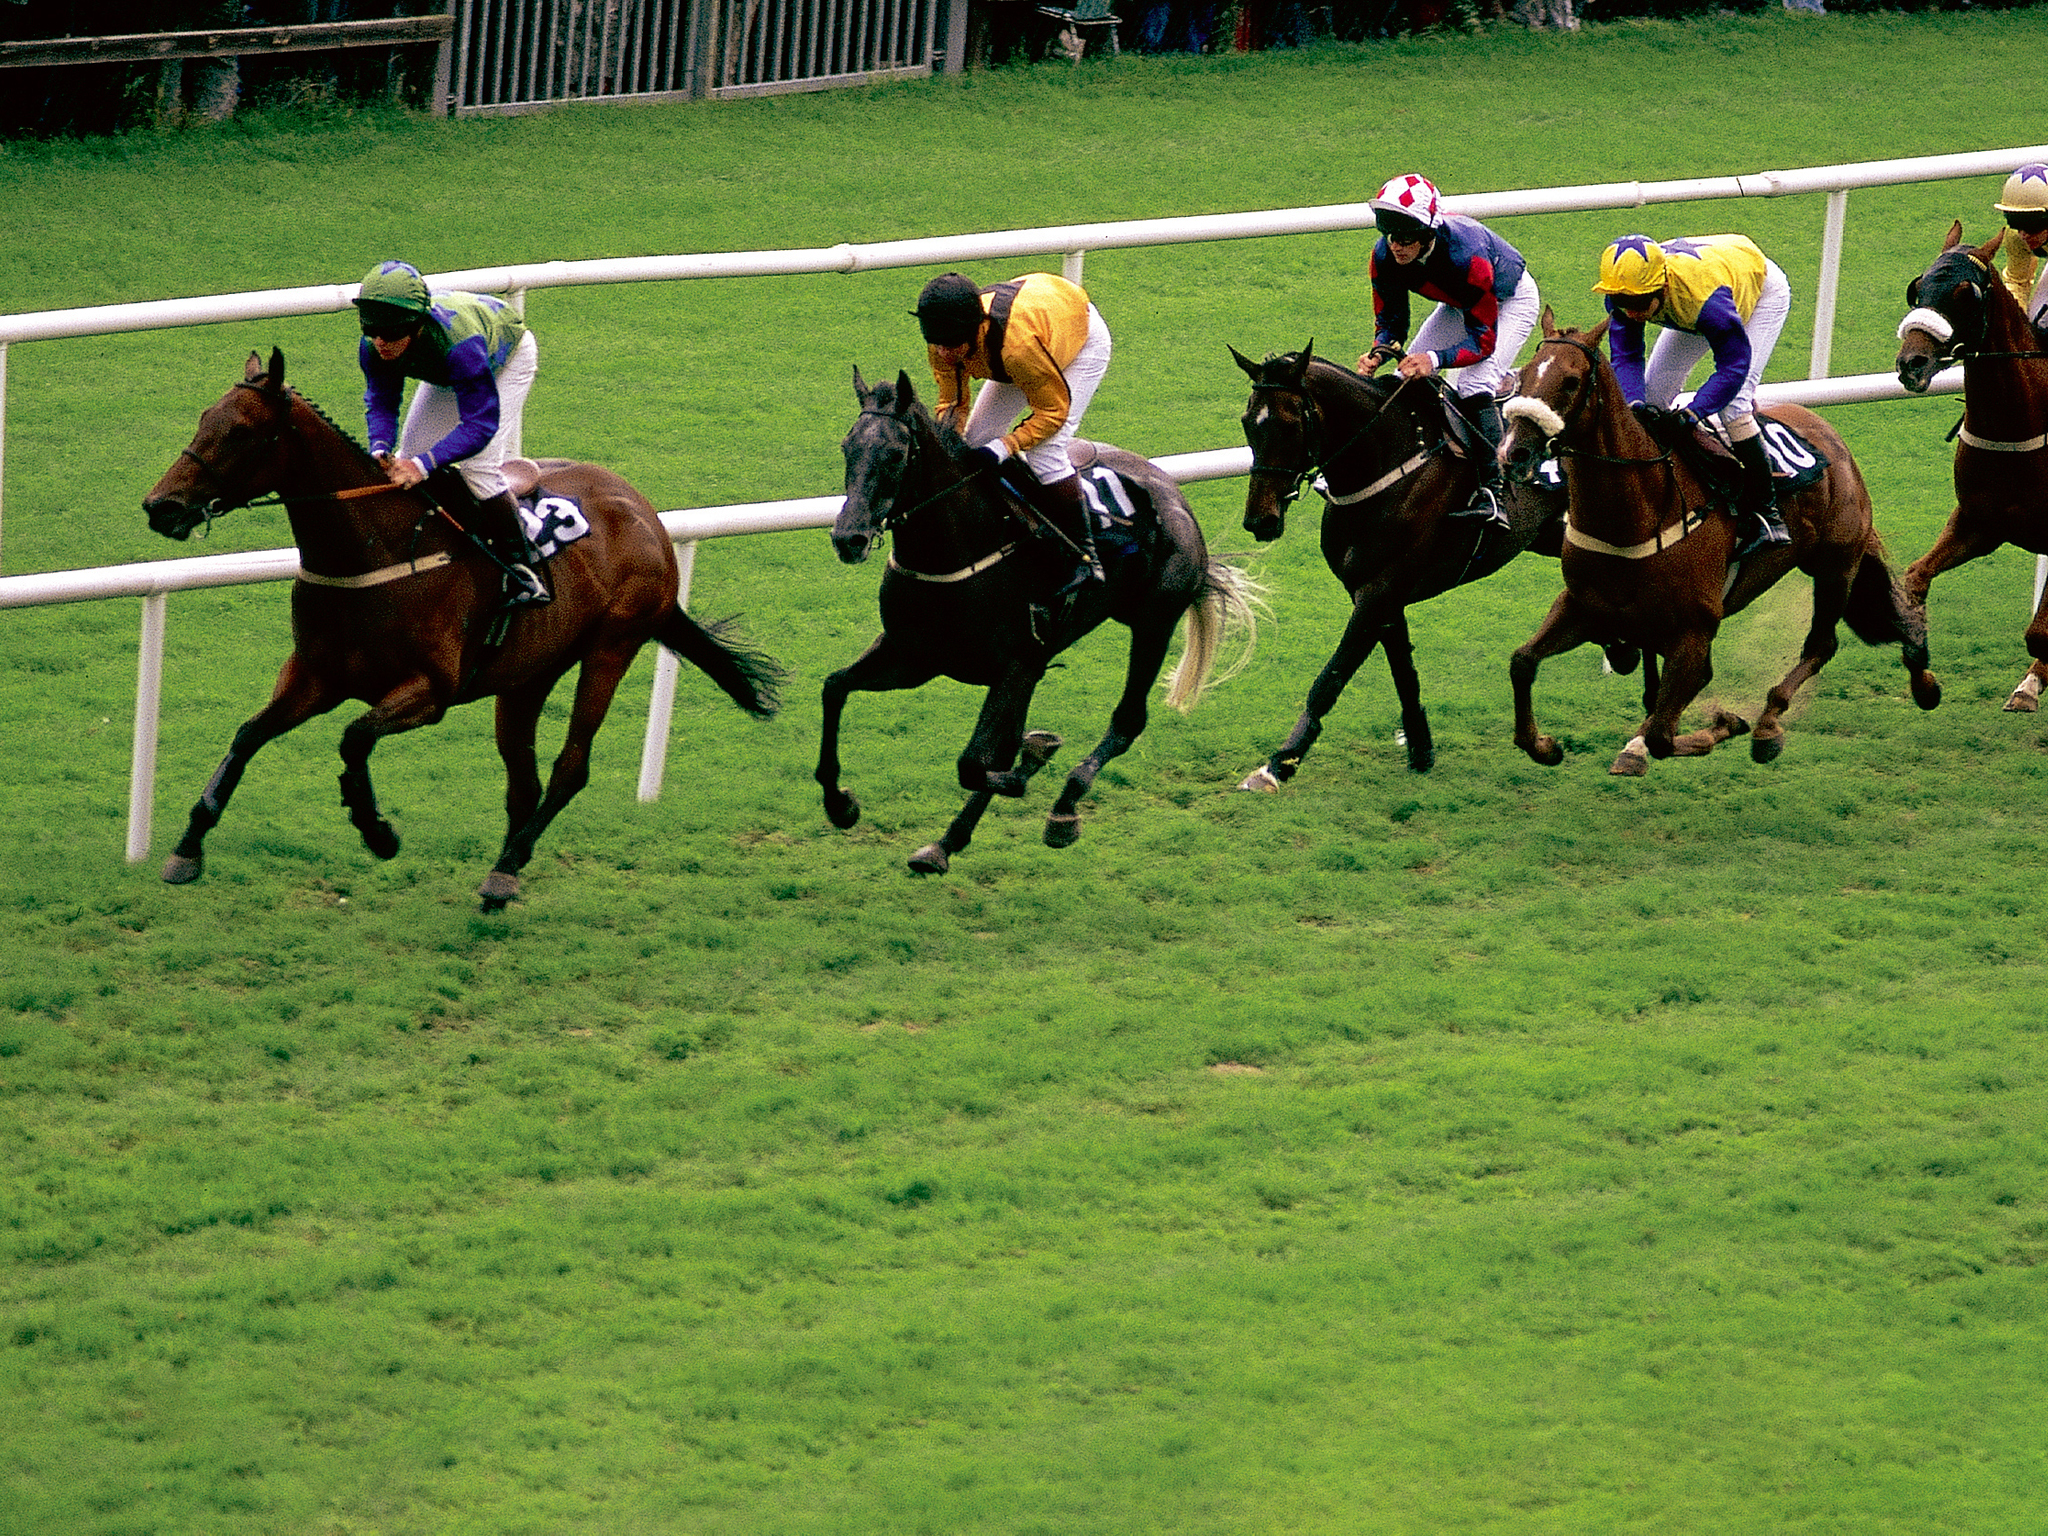 jockeys on horses racing